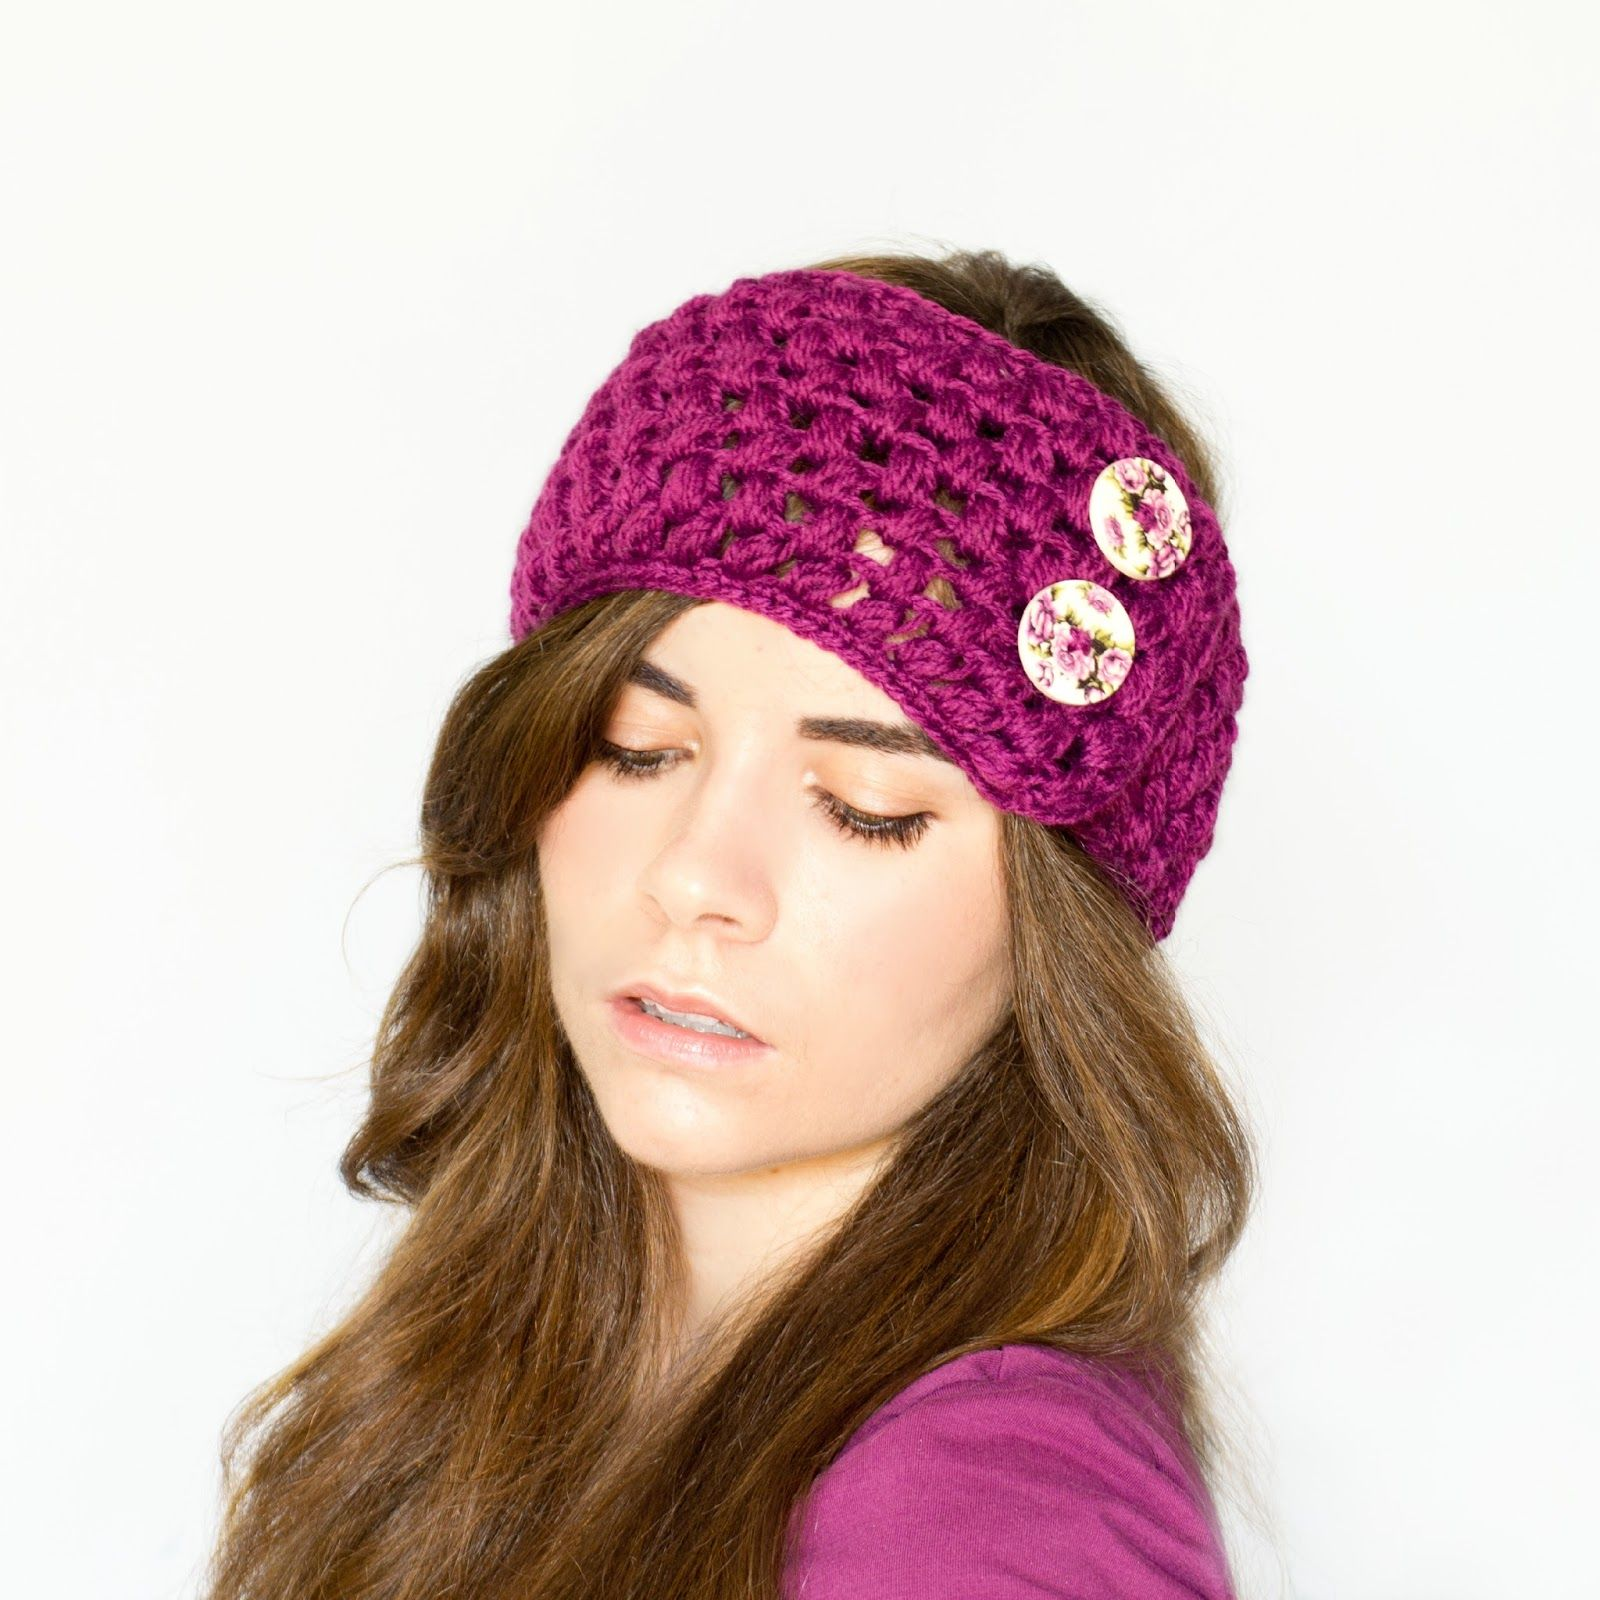 Puff Stitch Ear Warmer Crochet Pattern | Hopeful honey, Crochet ...